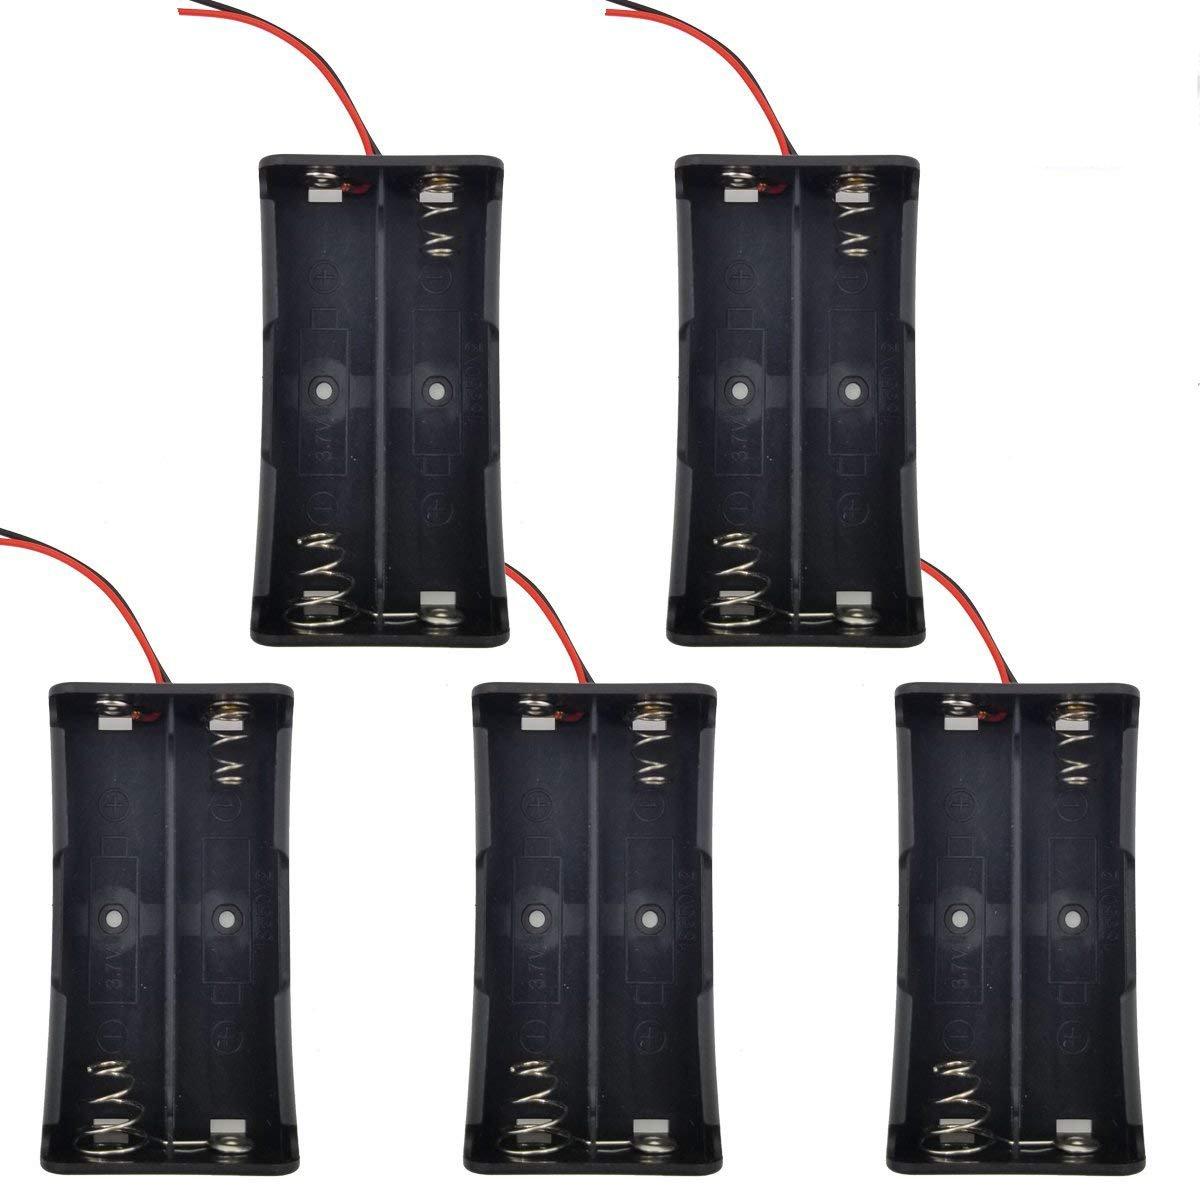 2PCS 3 x 18650 Parallel Plastic Battery Holder Case Box for Powerful Flashlight